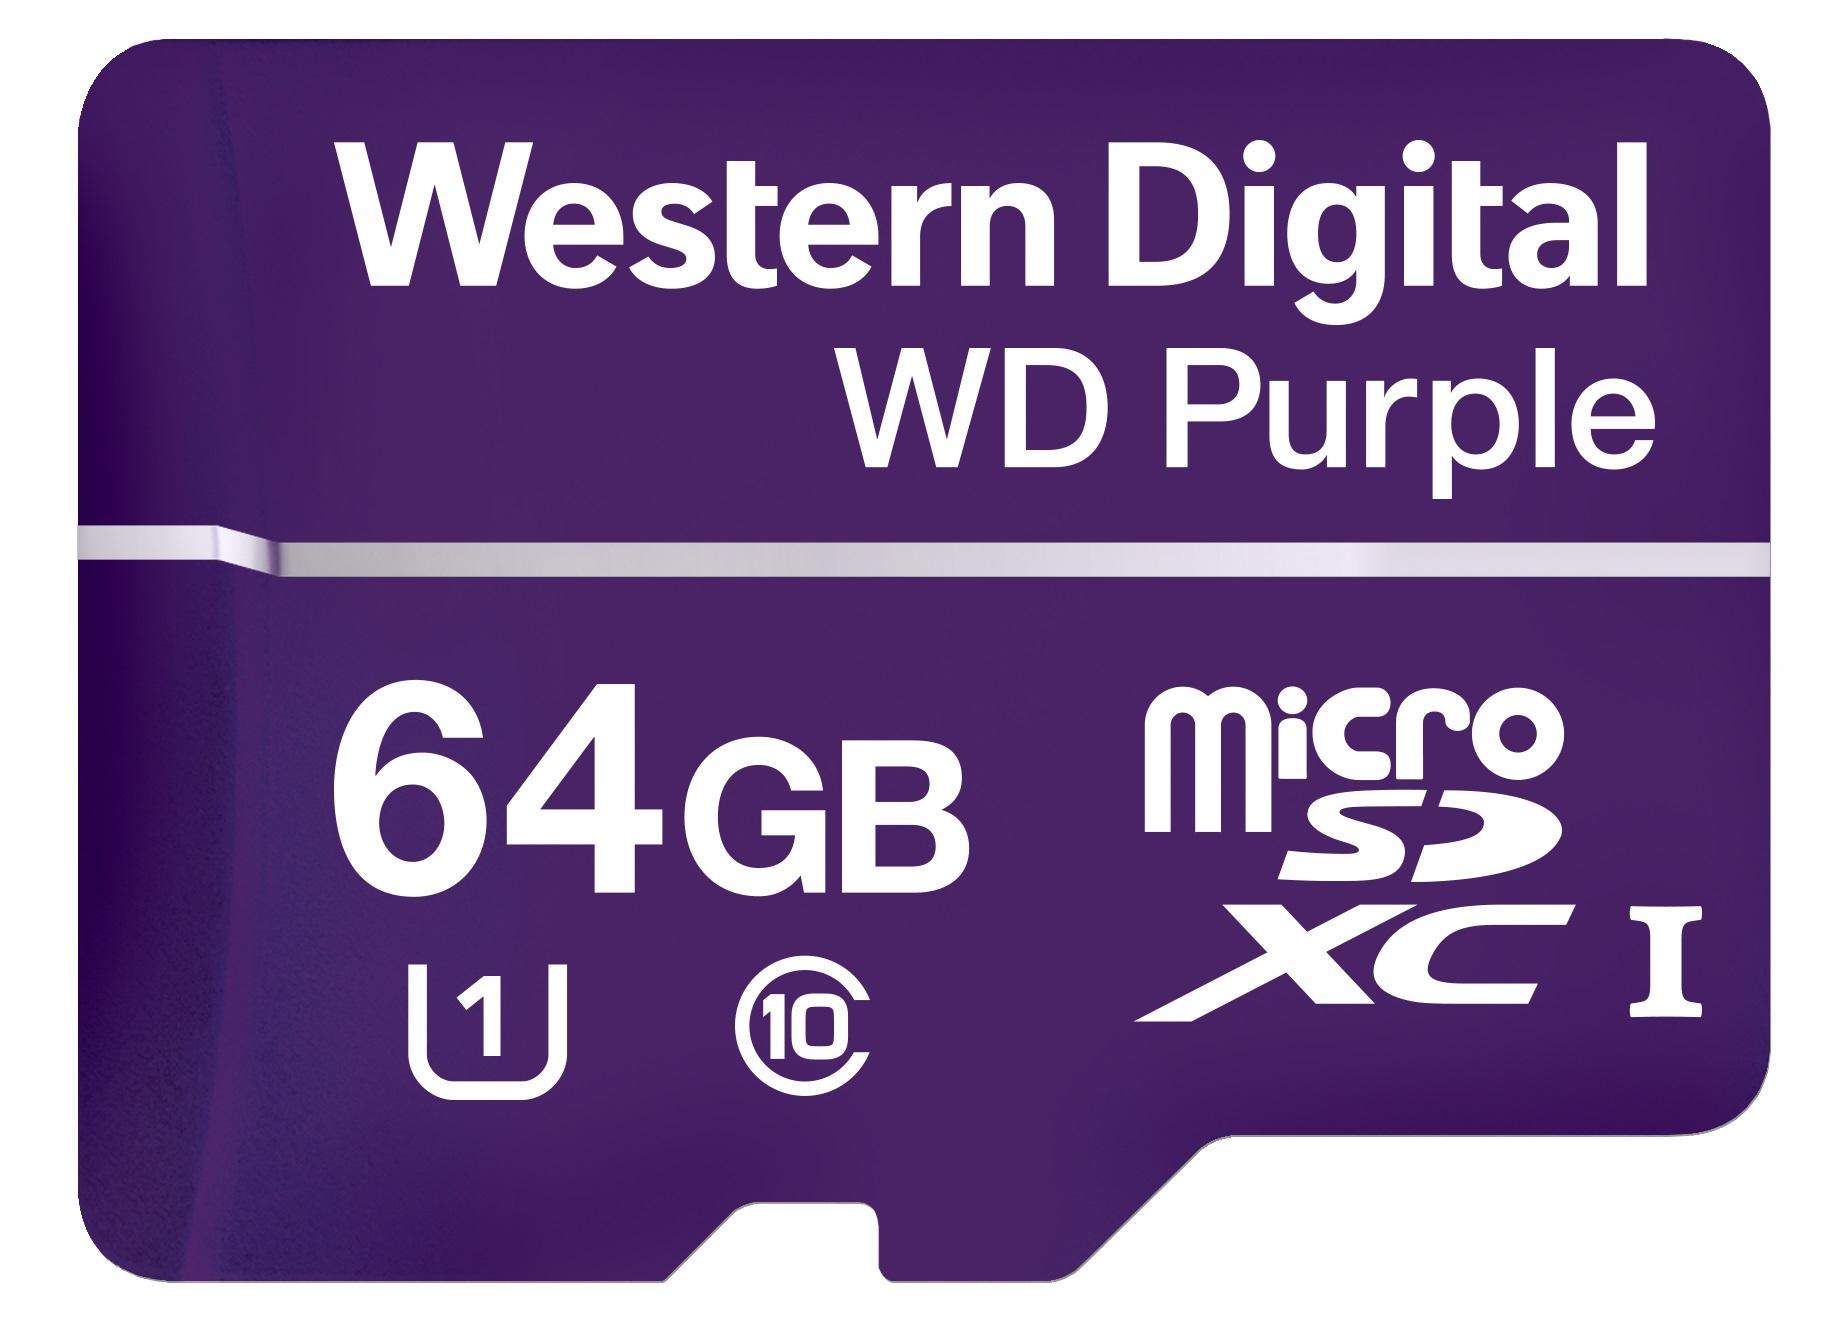 Western Digital Purple memoria flash 64 GB MicroSDXC Clase 10